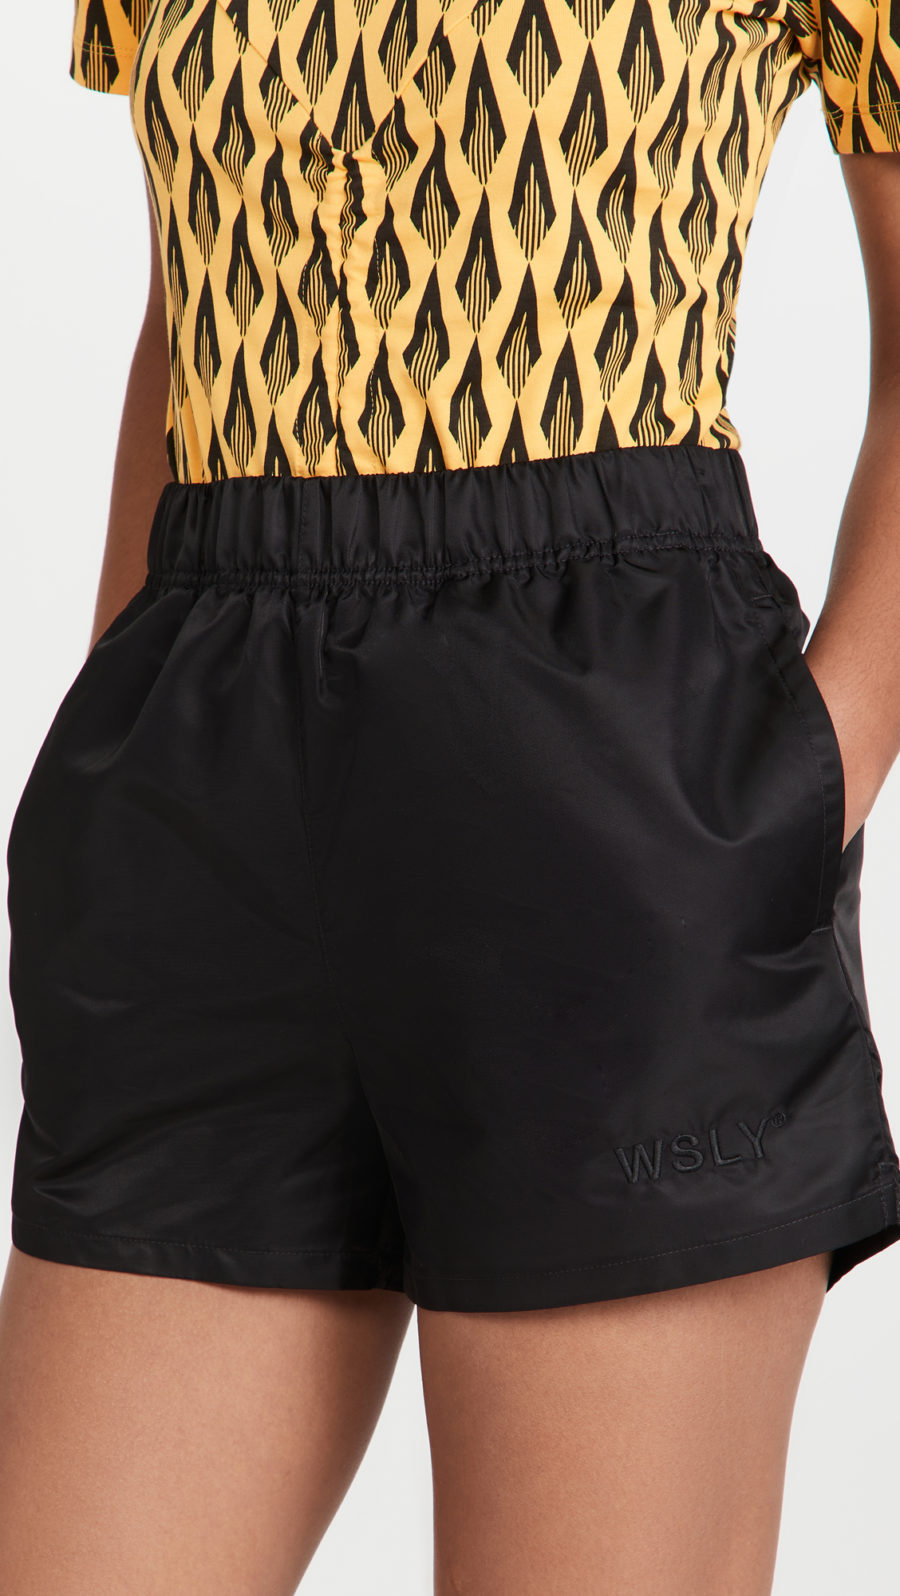 WSLY High Waist Nylon Shorts ($88)